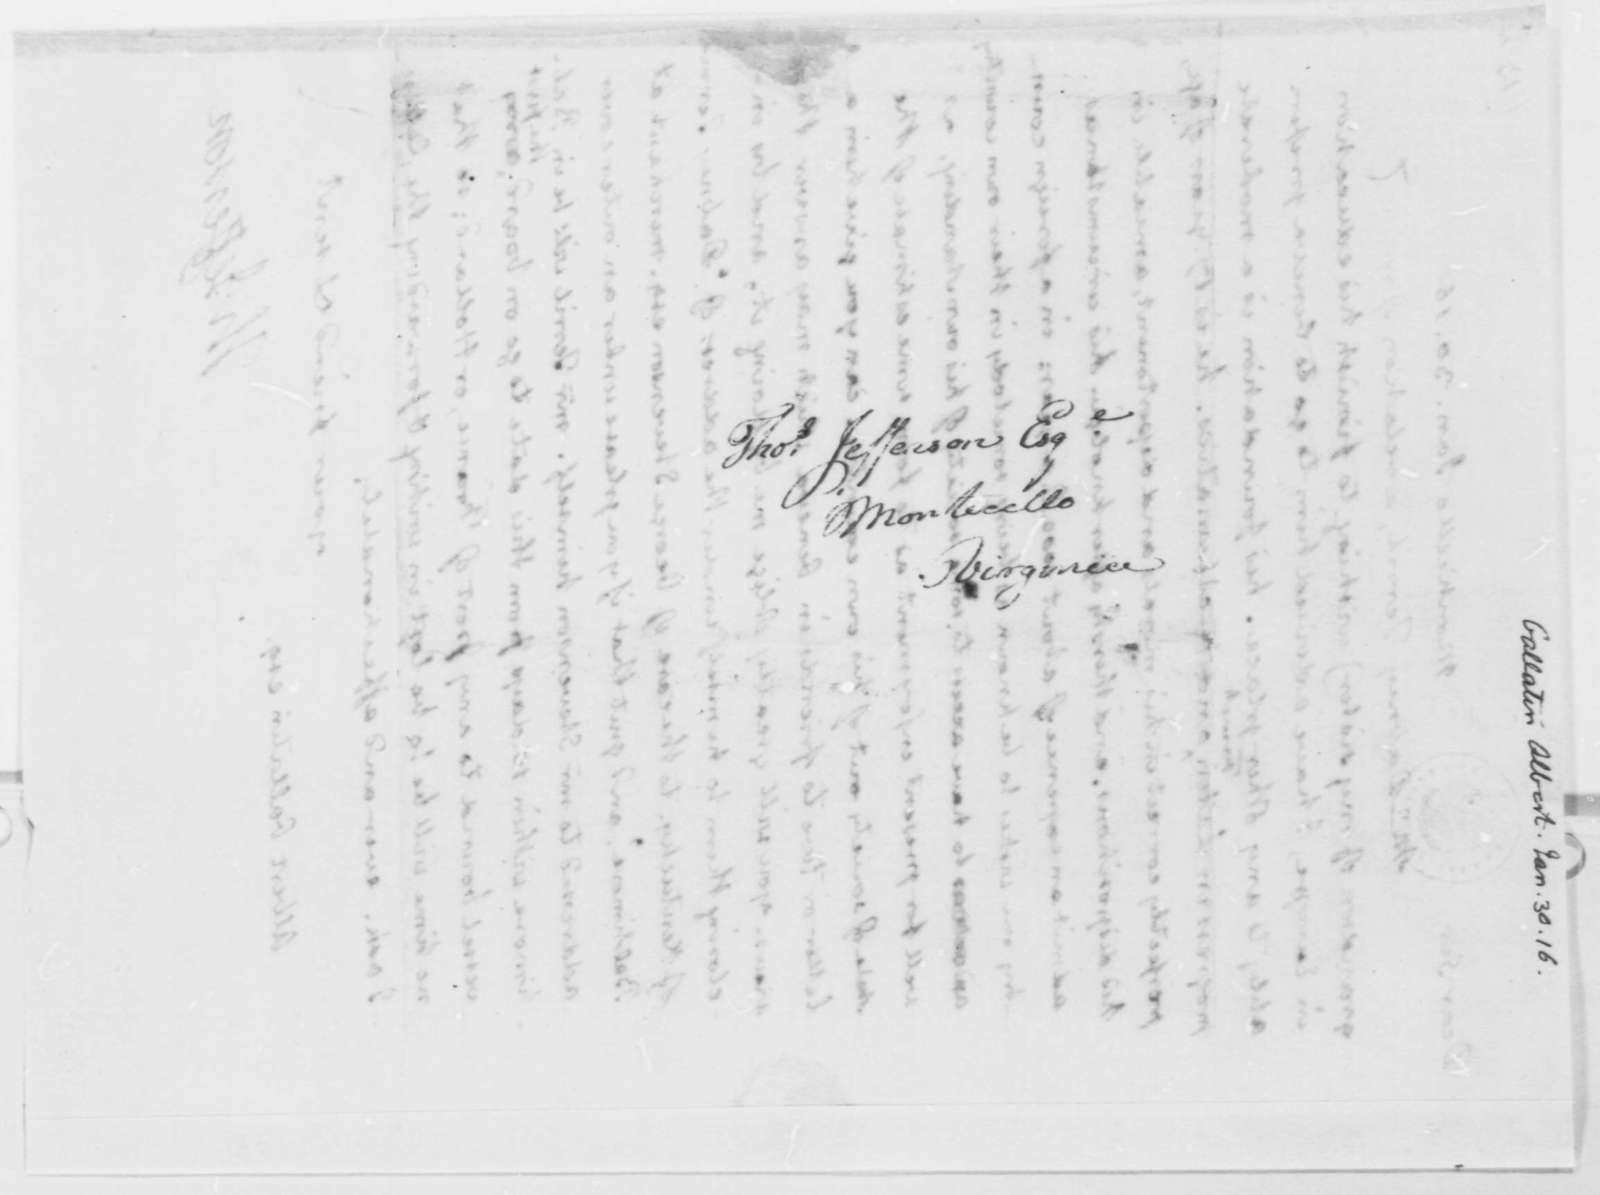 Thomas Jefferson to Albert Gallatin, January 30, 1816